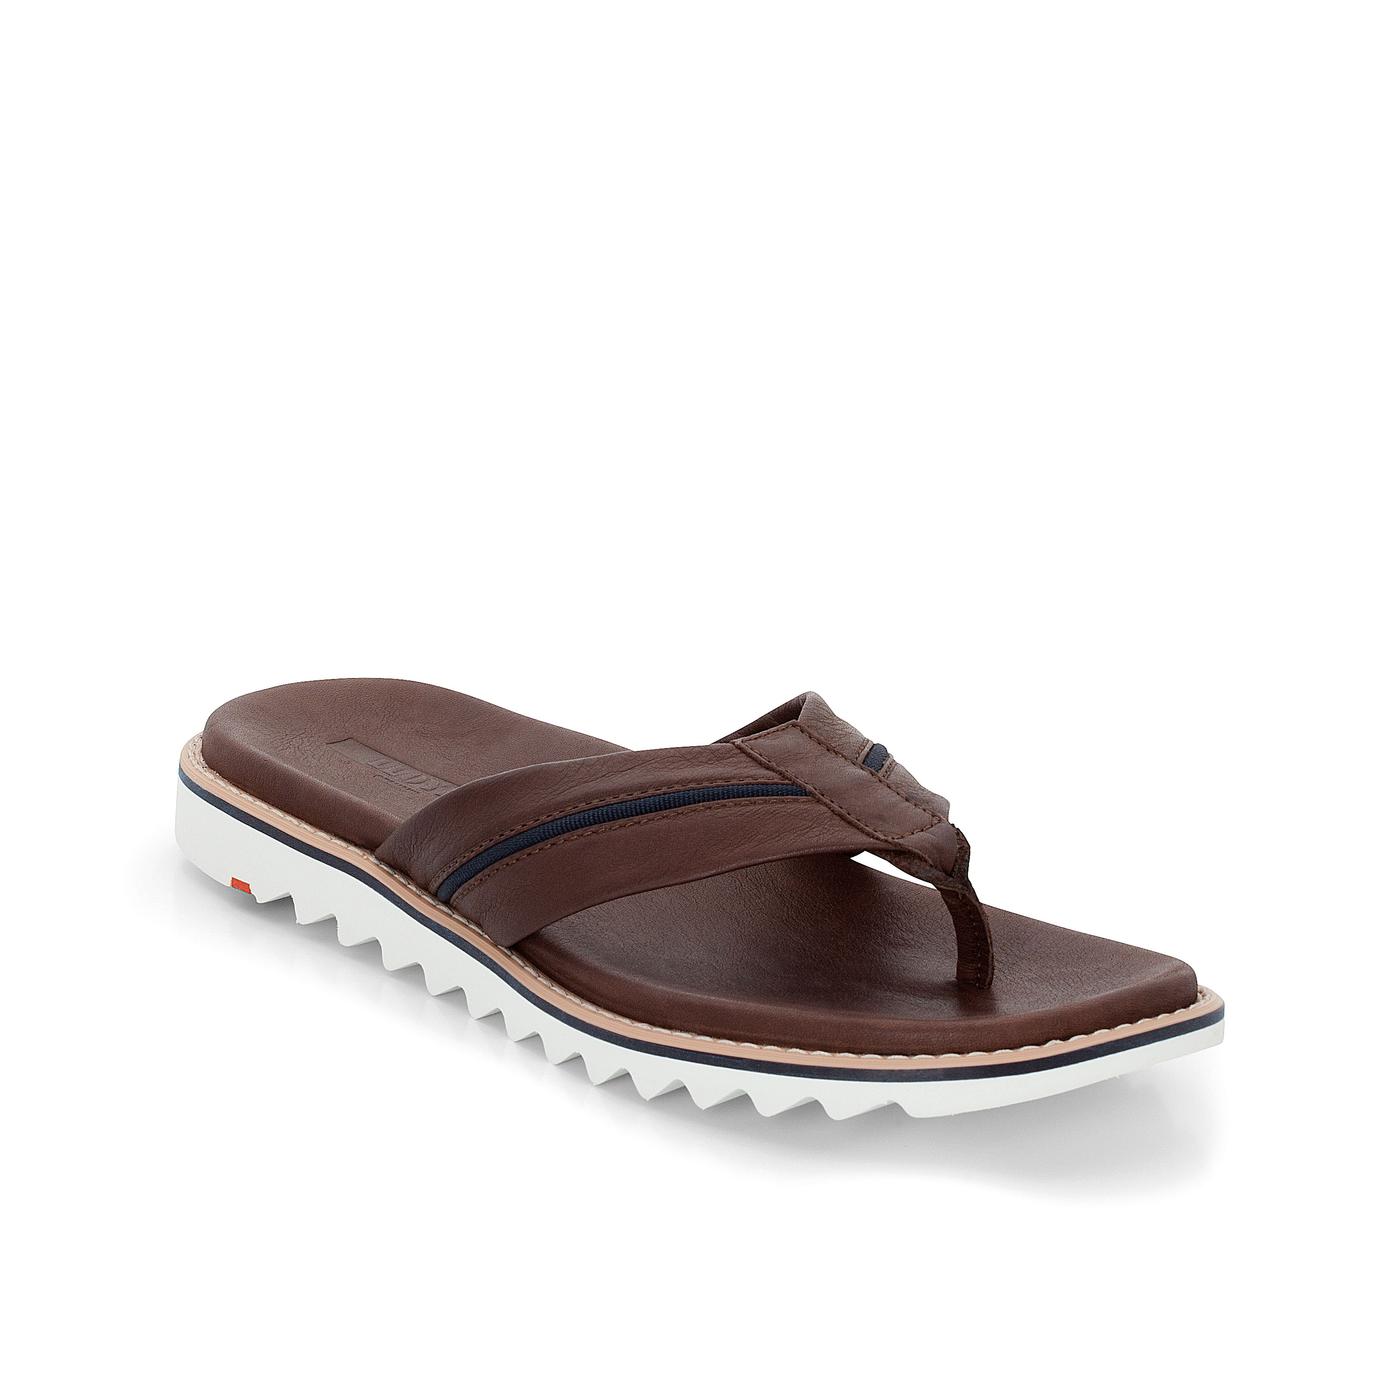 ELKAN   Schuhe > Sandalen & Zehentrenner > Zehentrenner   Lloyd